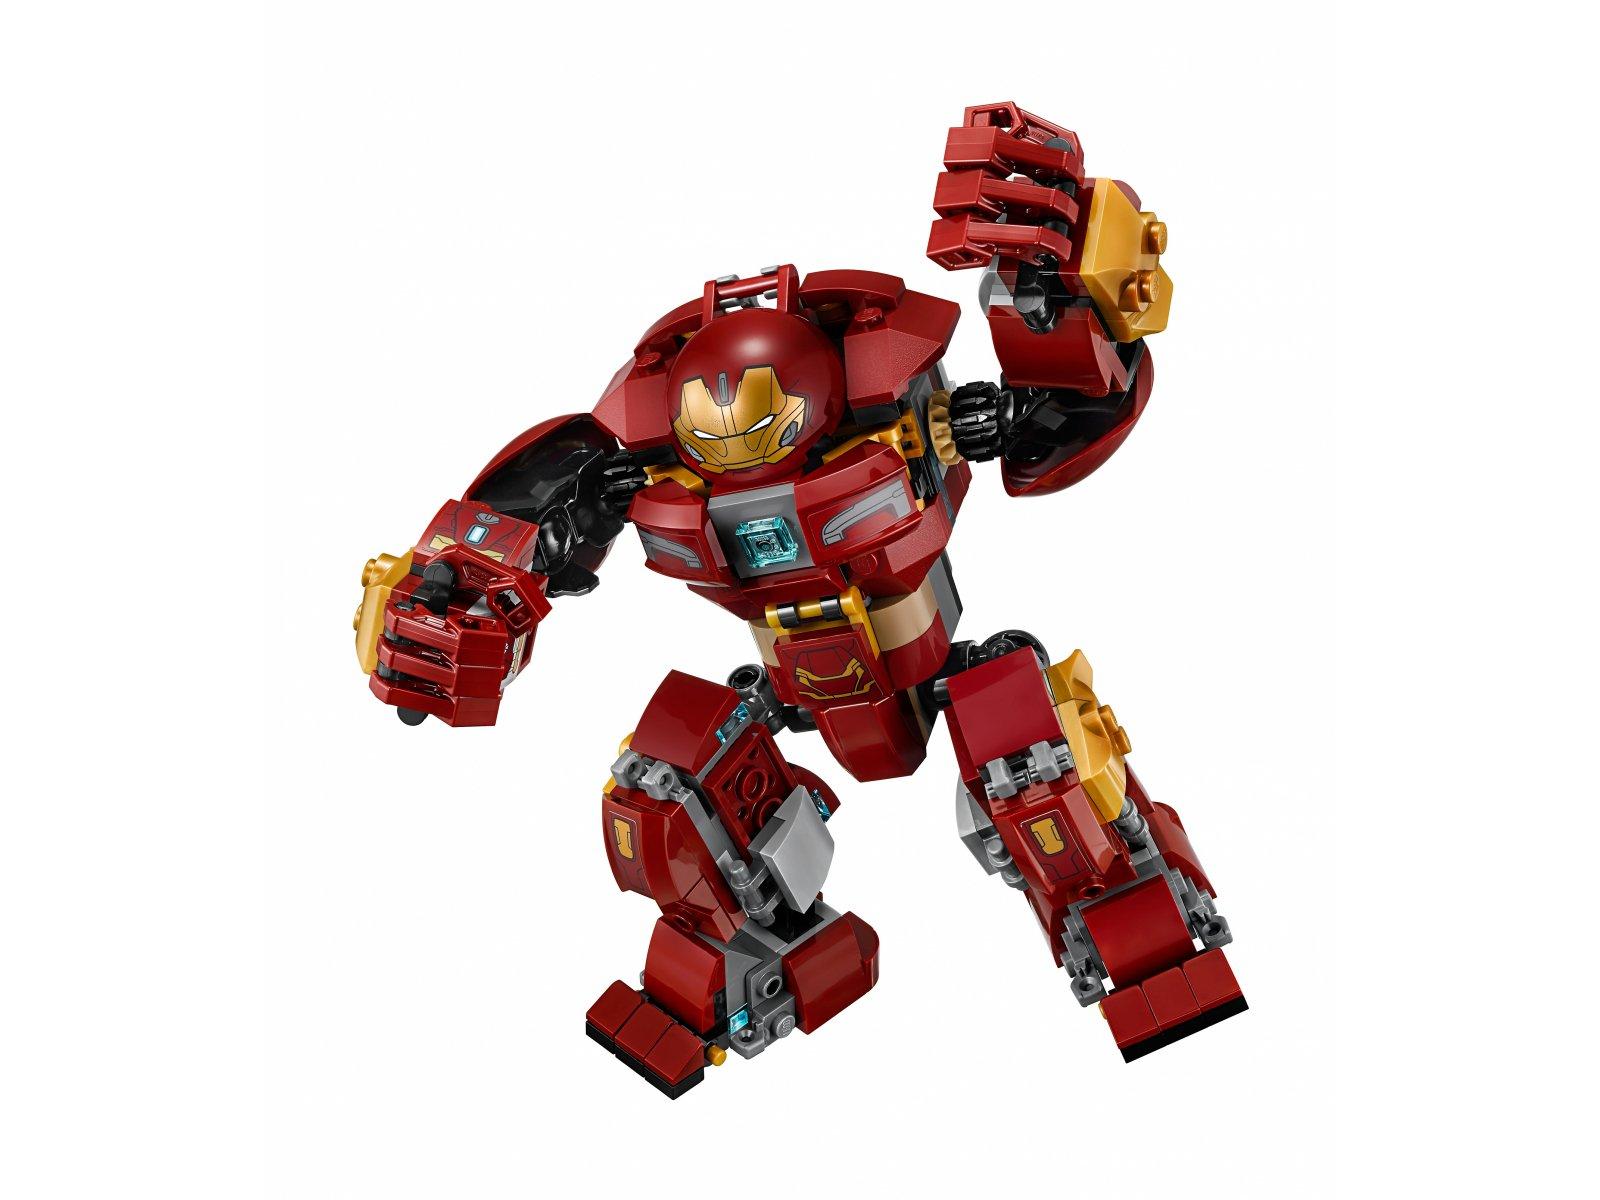 LEGO Marvel Super Heroes 76104 Walka w Hulkbusterze